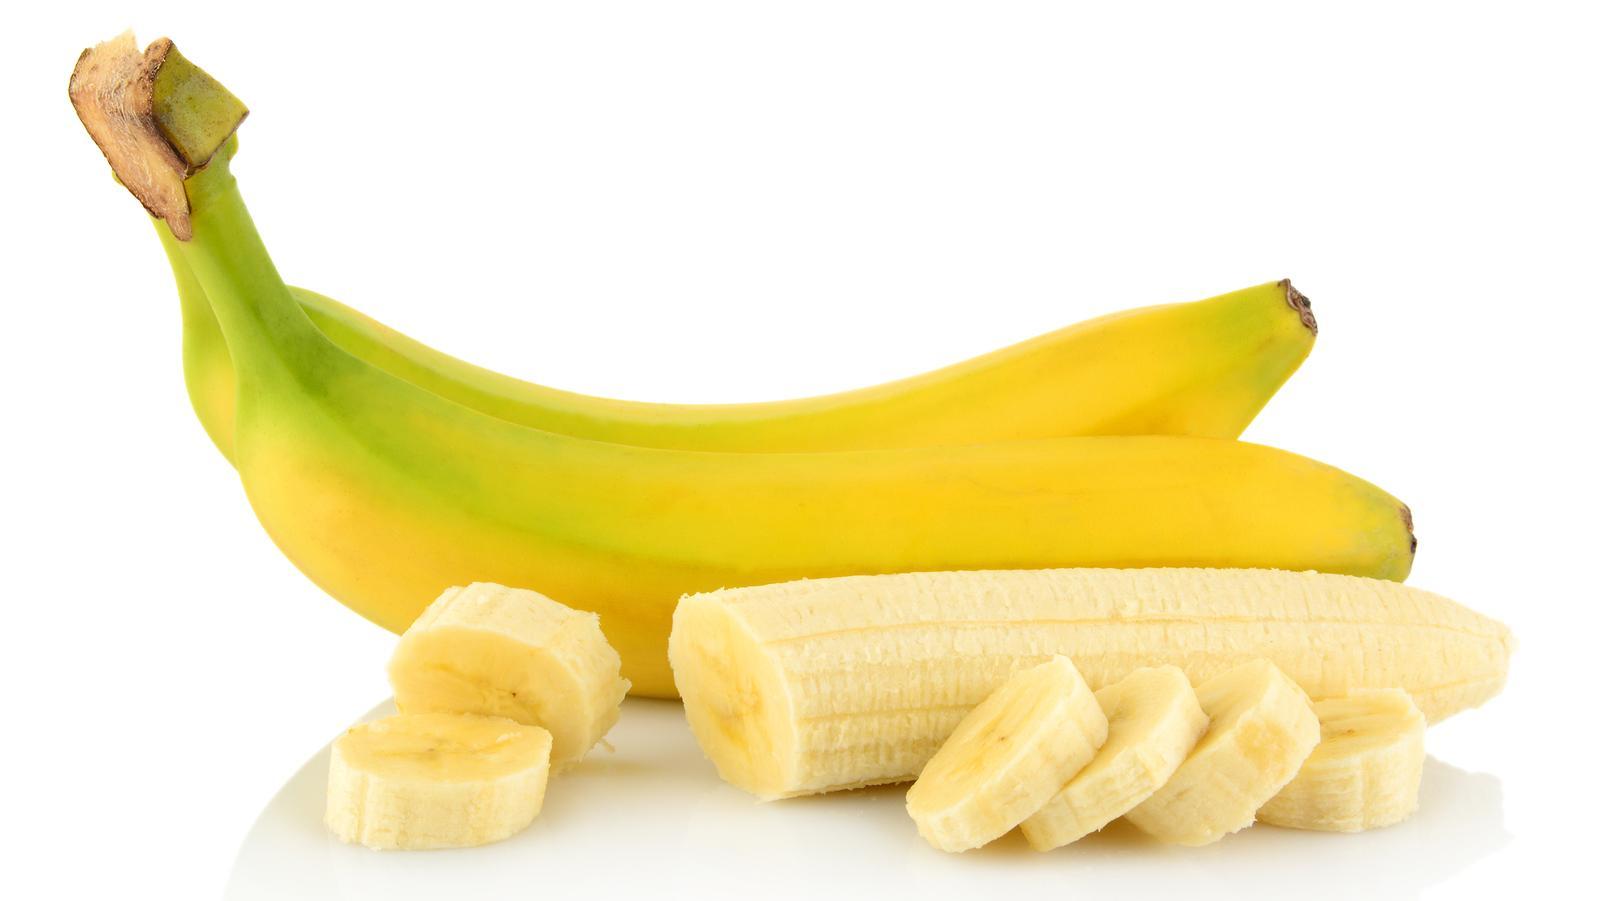 sieben wohltuende wirkungen der banane 1. Black Bedroom Furniture Sets. Home Design Ideas